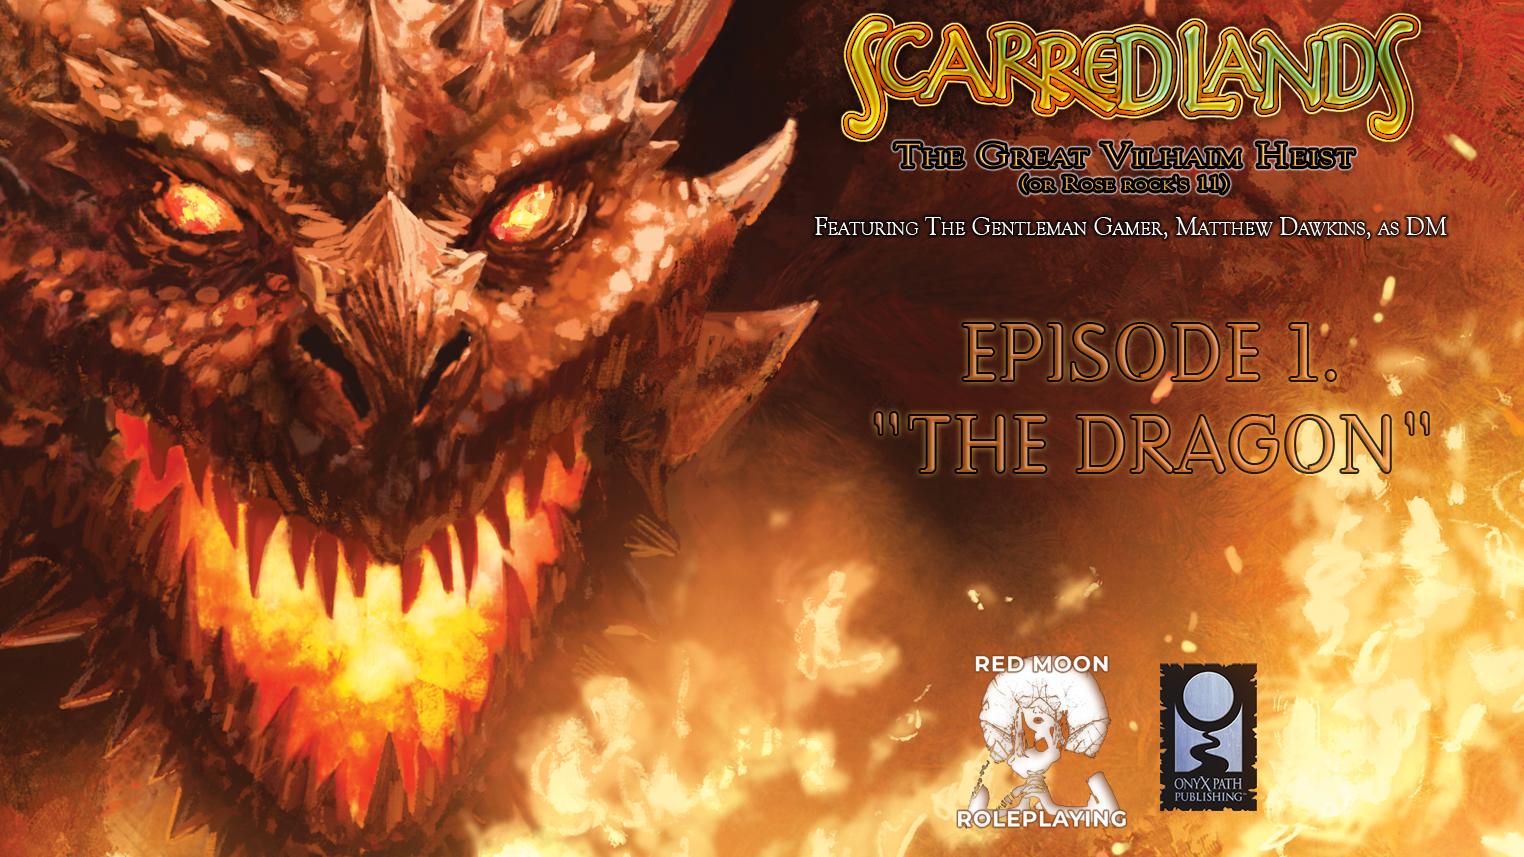 SCARRED_01.JPG